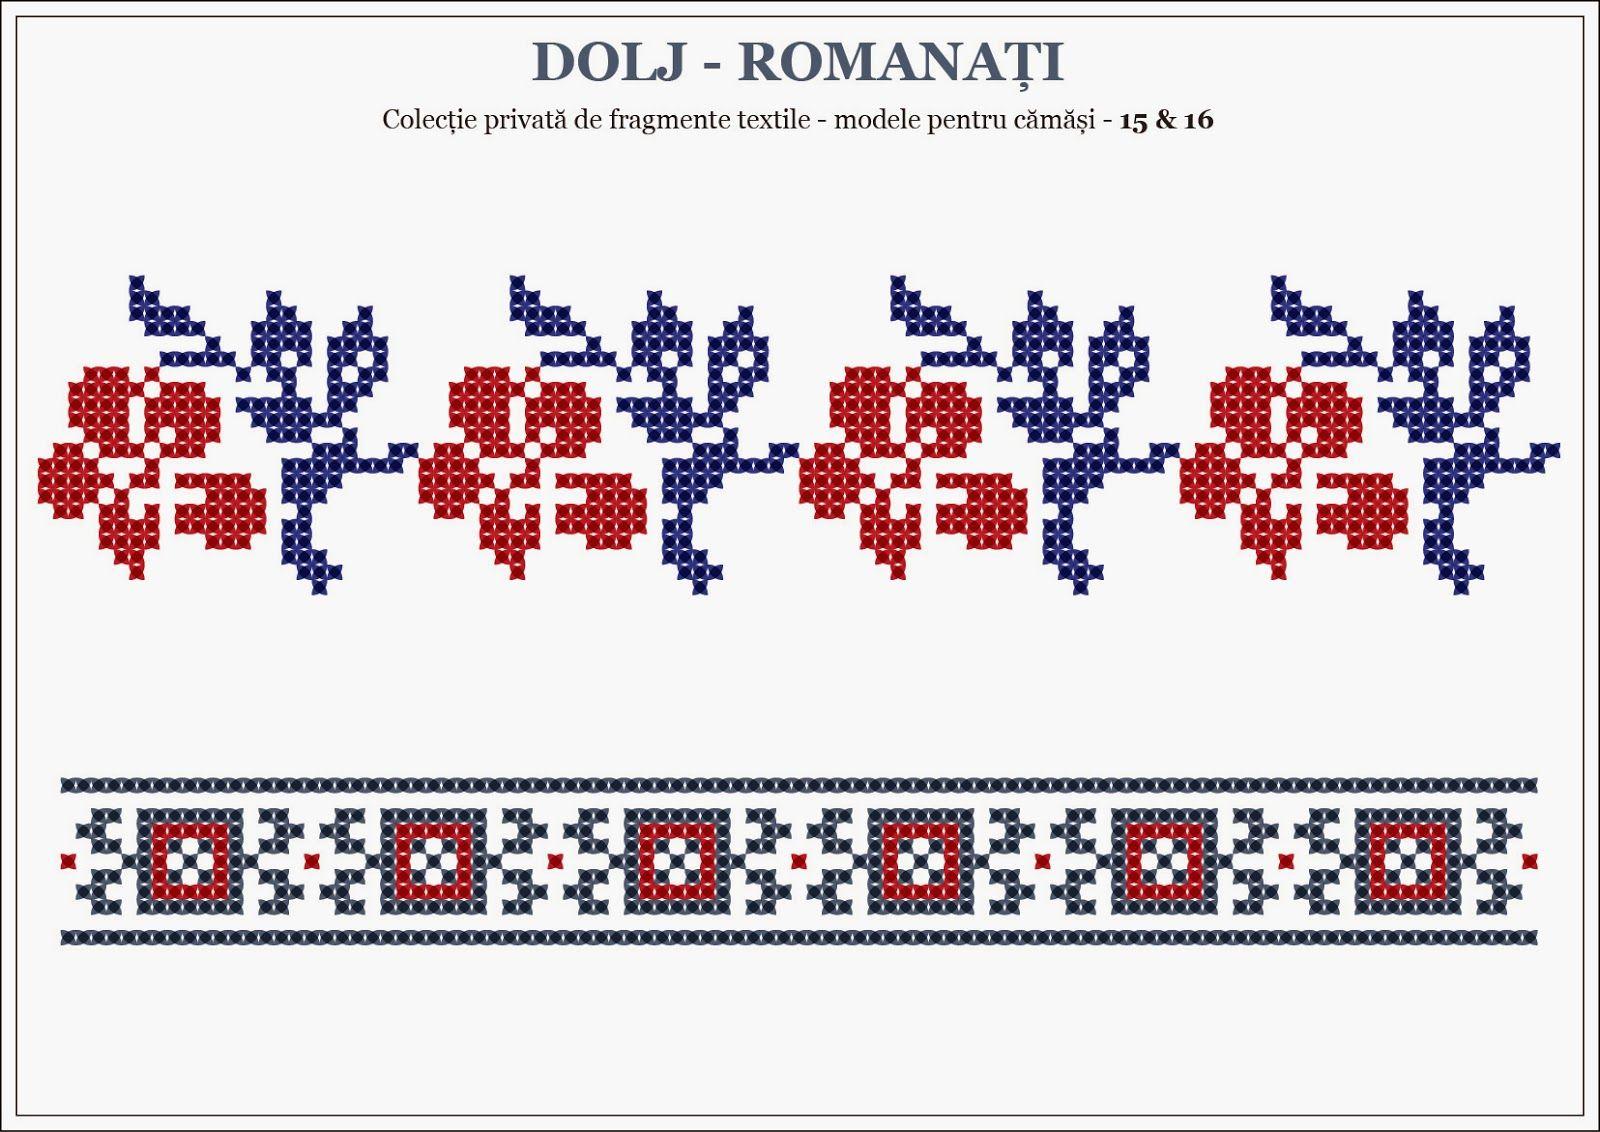 Semne Cusute Romanian Traditional Motifs Oltenia Dolj Romanati Px Pinterest Google